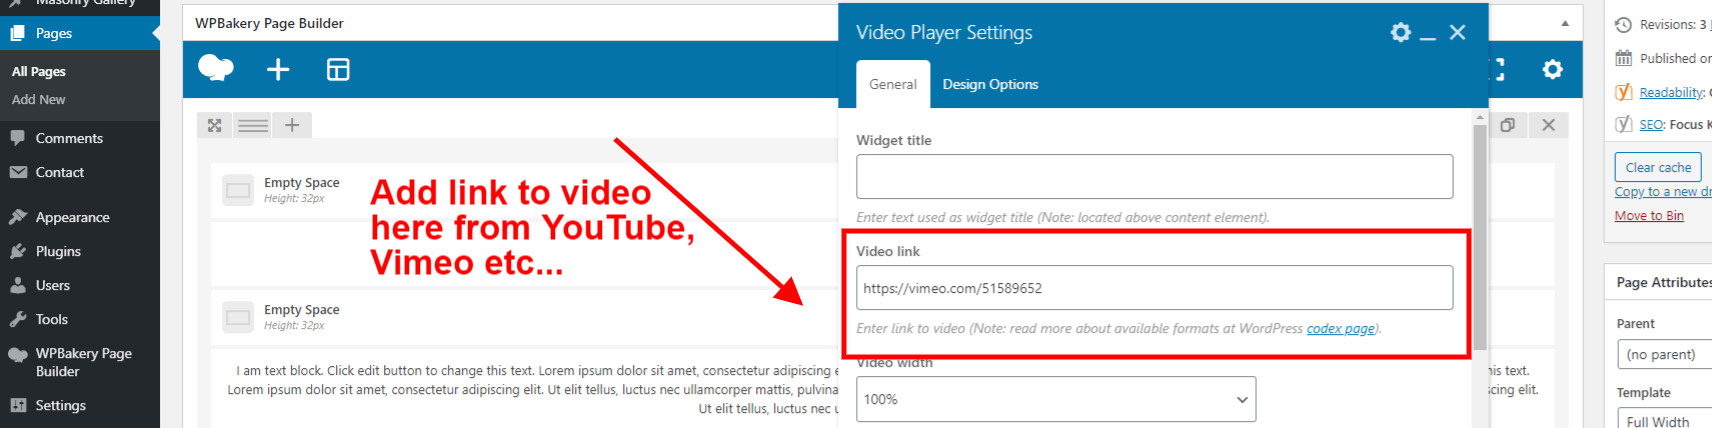 Add Video link